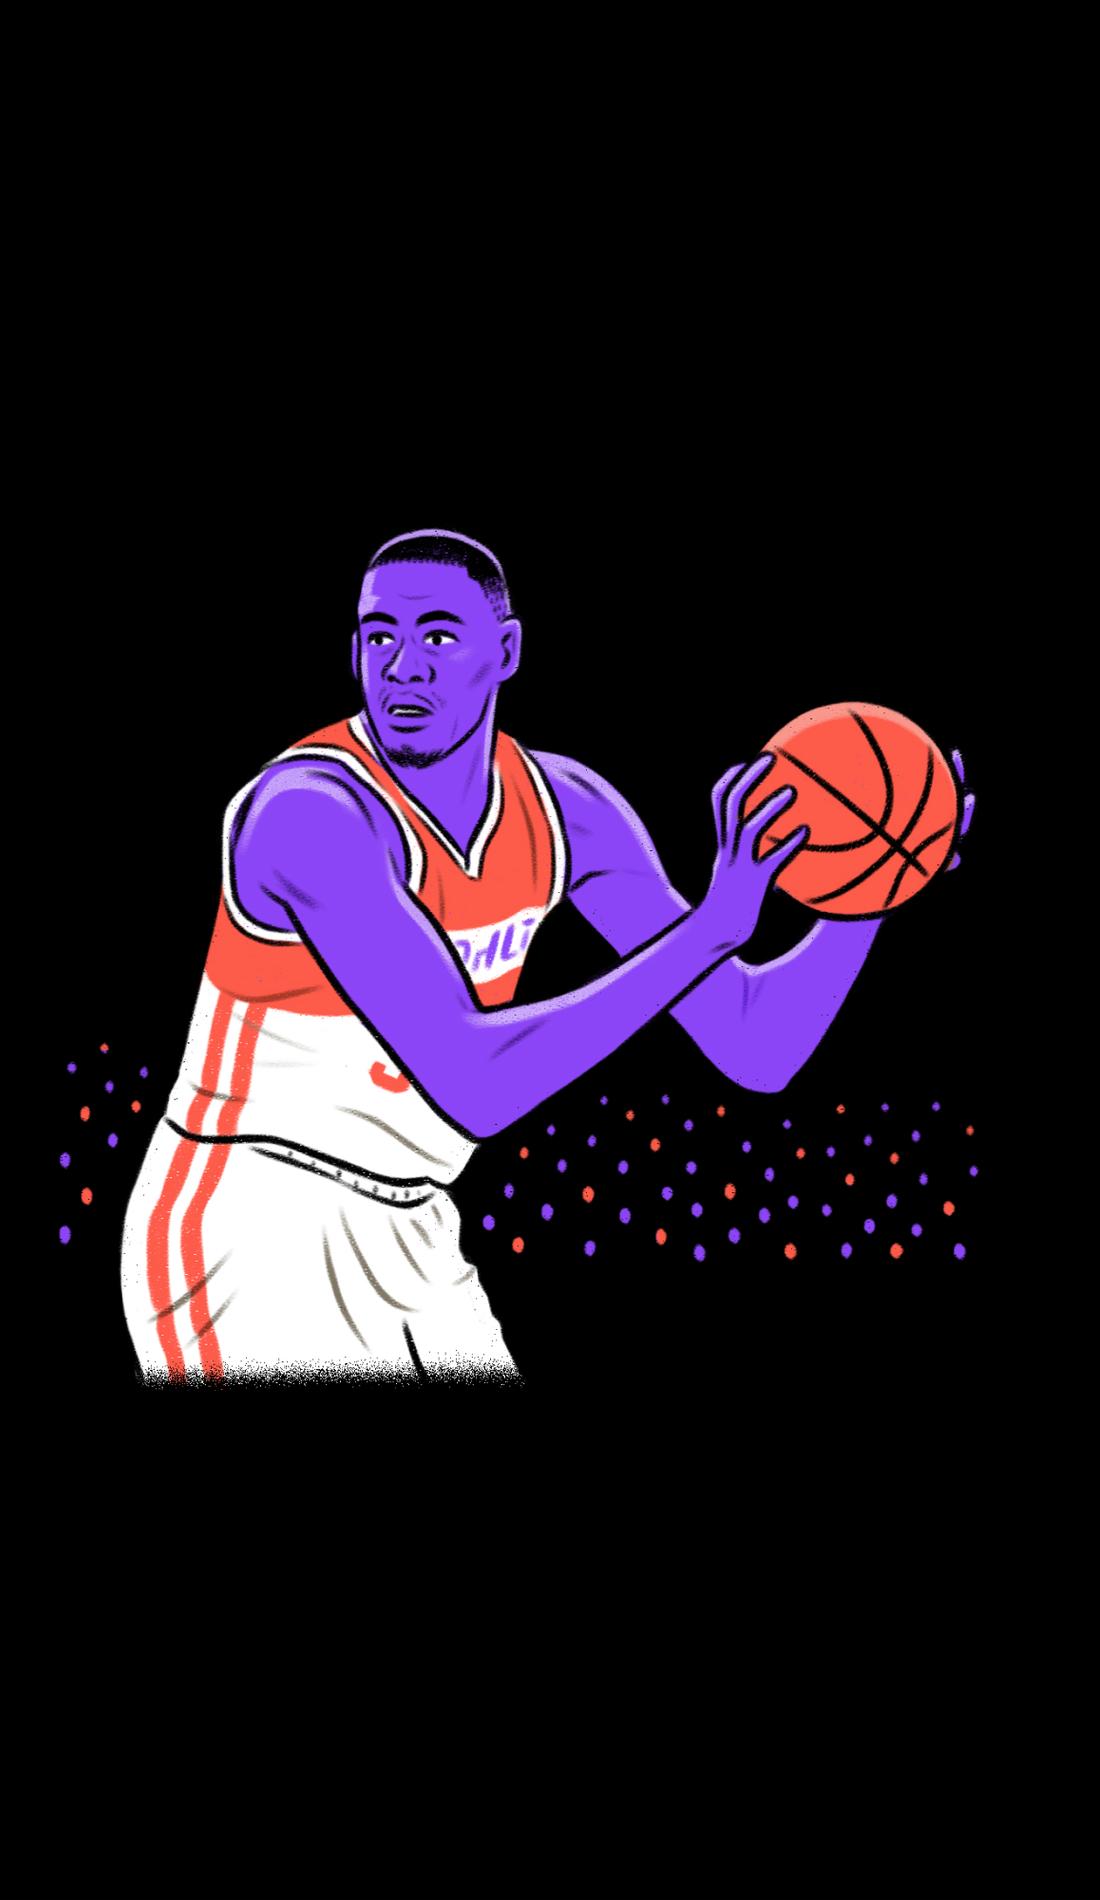 A Montana State Bobcats Basketball live event